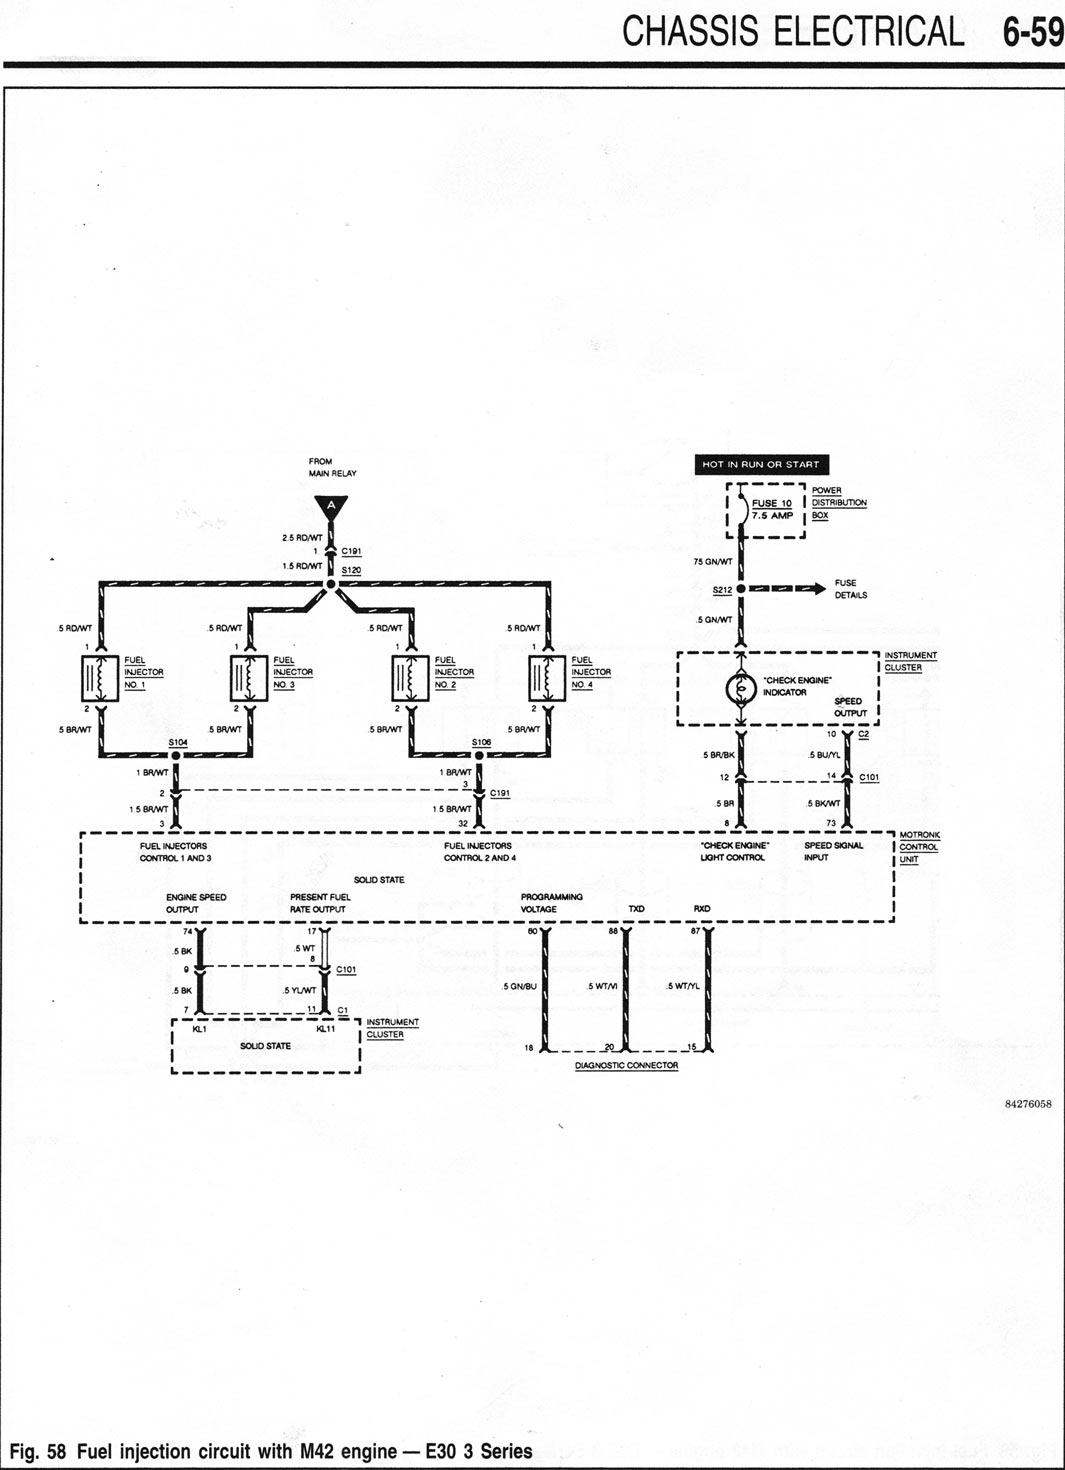 bmw 318is wiring diagram